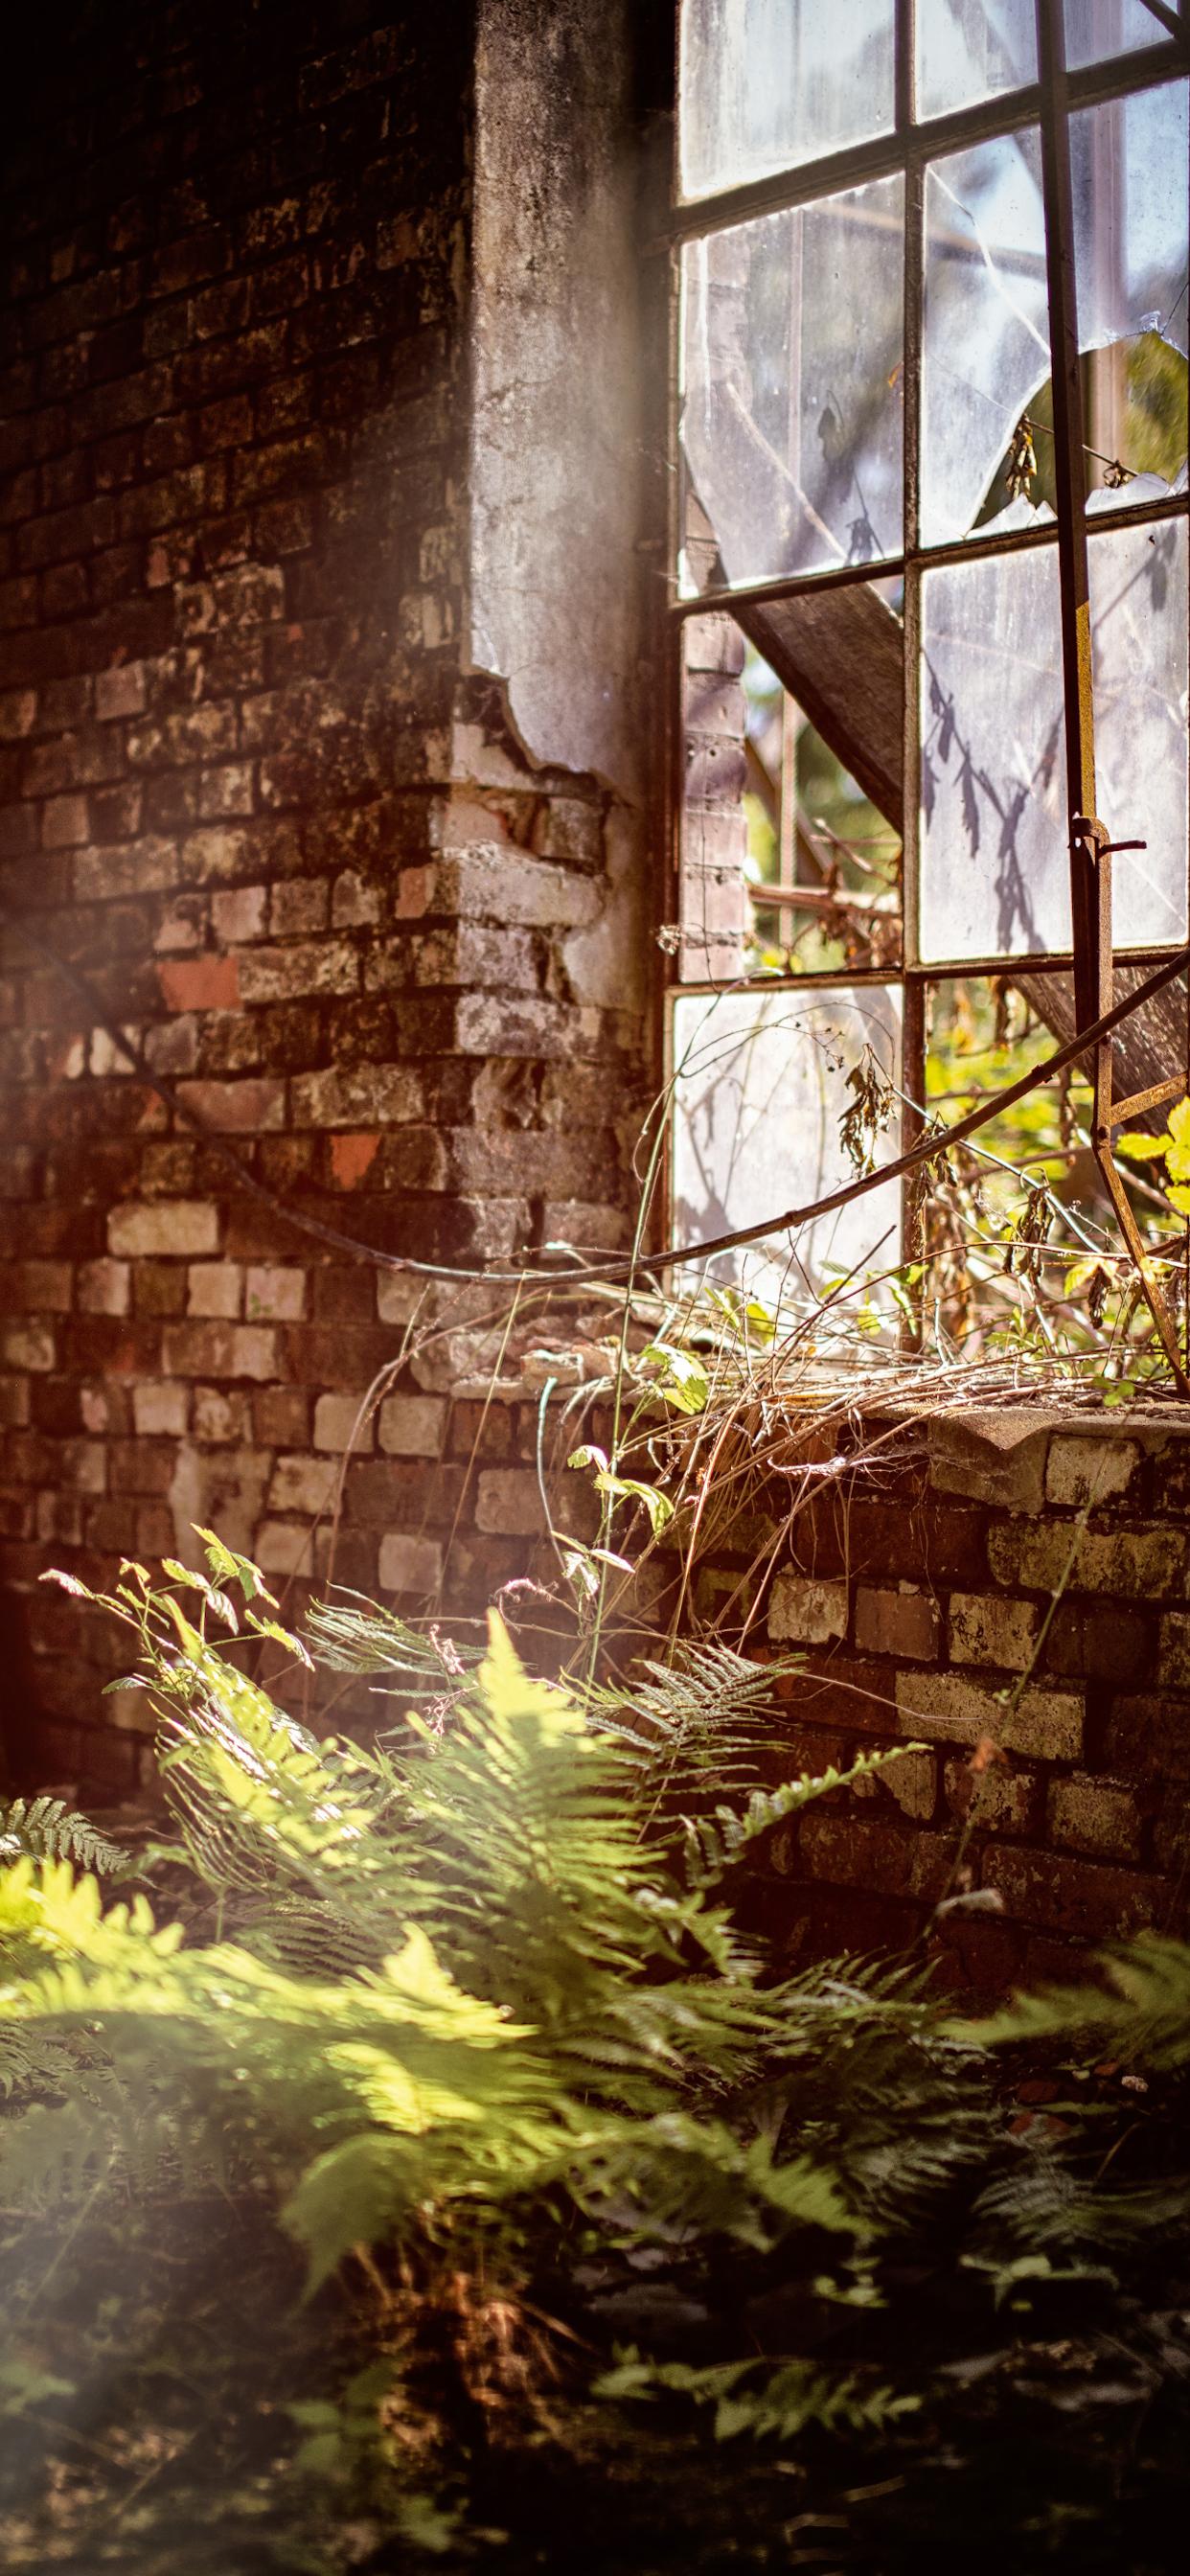 iPhone wallpapers abandoned room plants Fonds d'écran iPhone du 29/10/2019